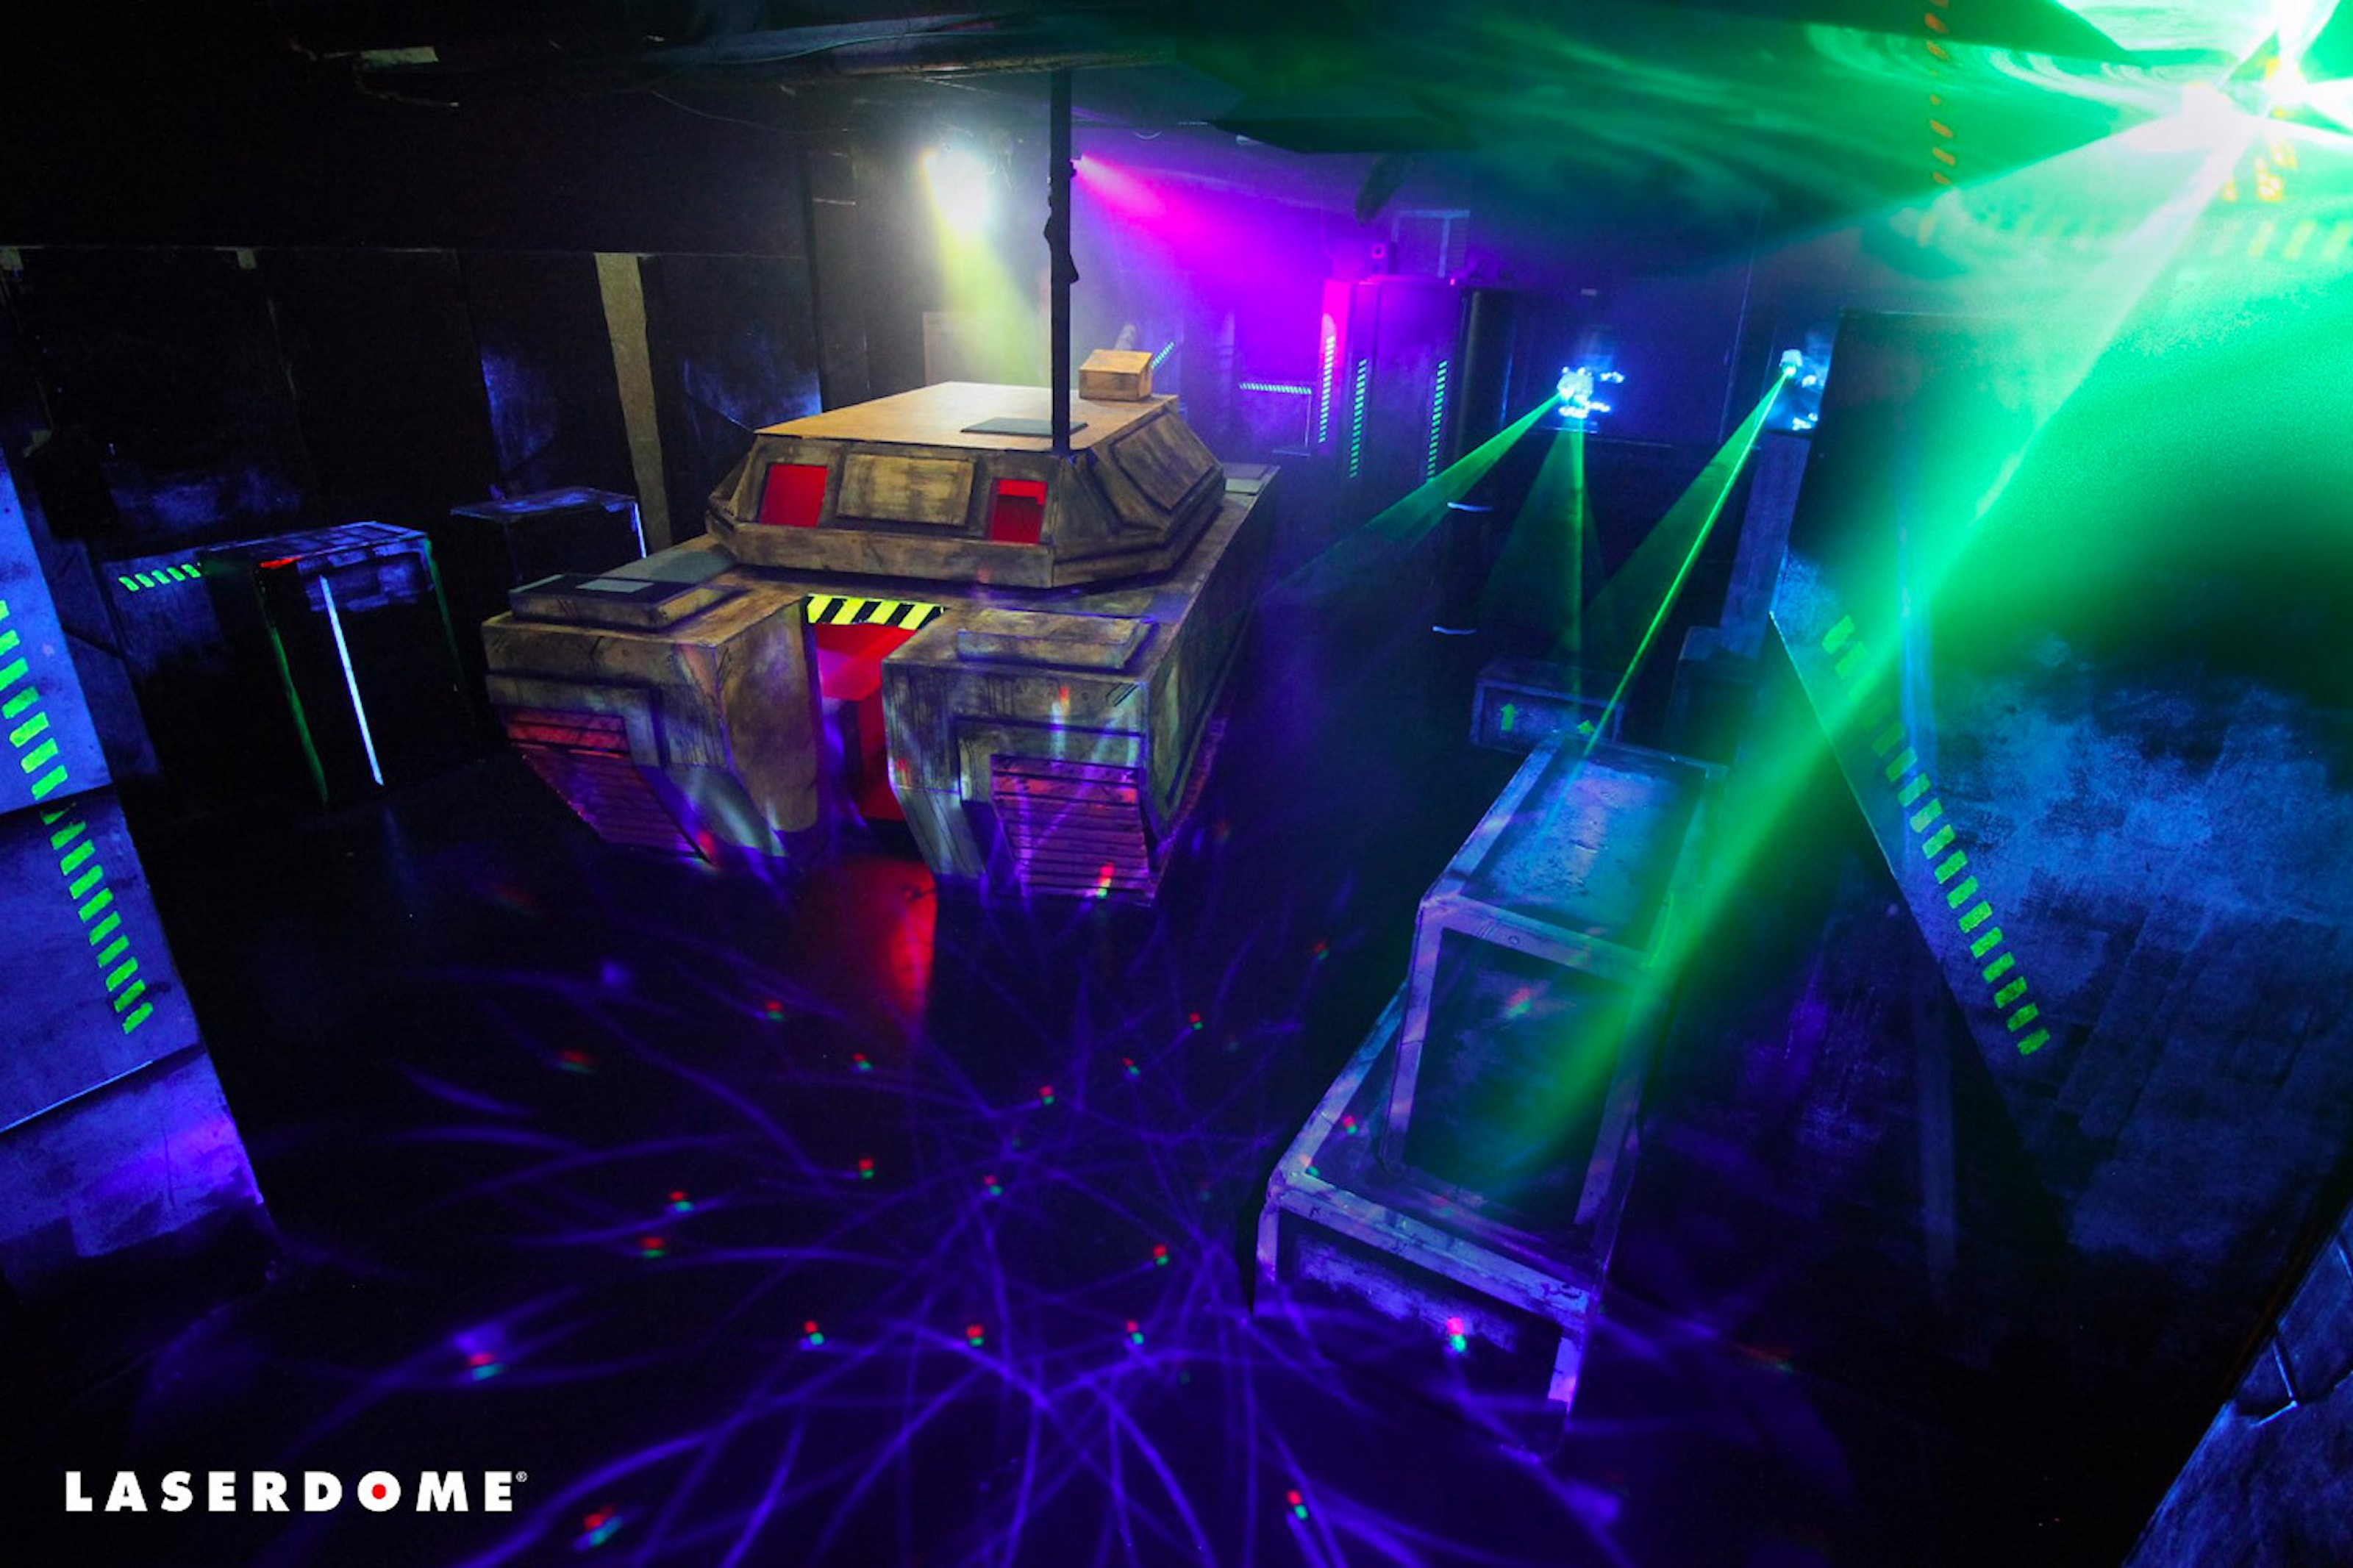 Spela Laserdome